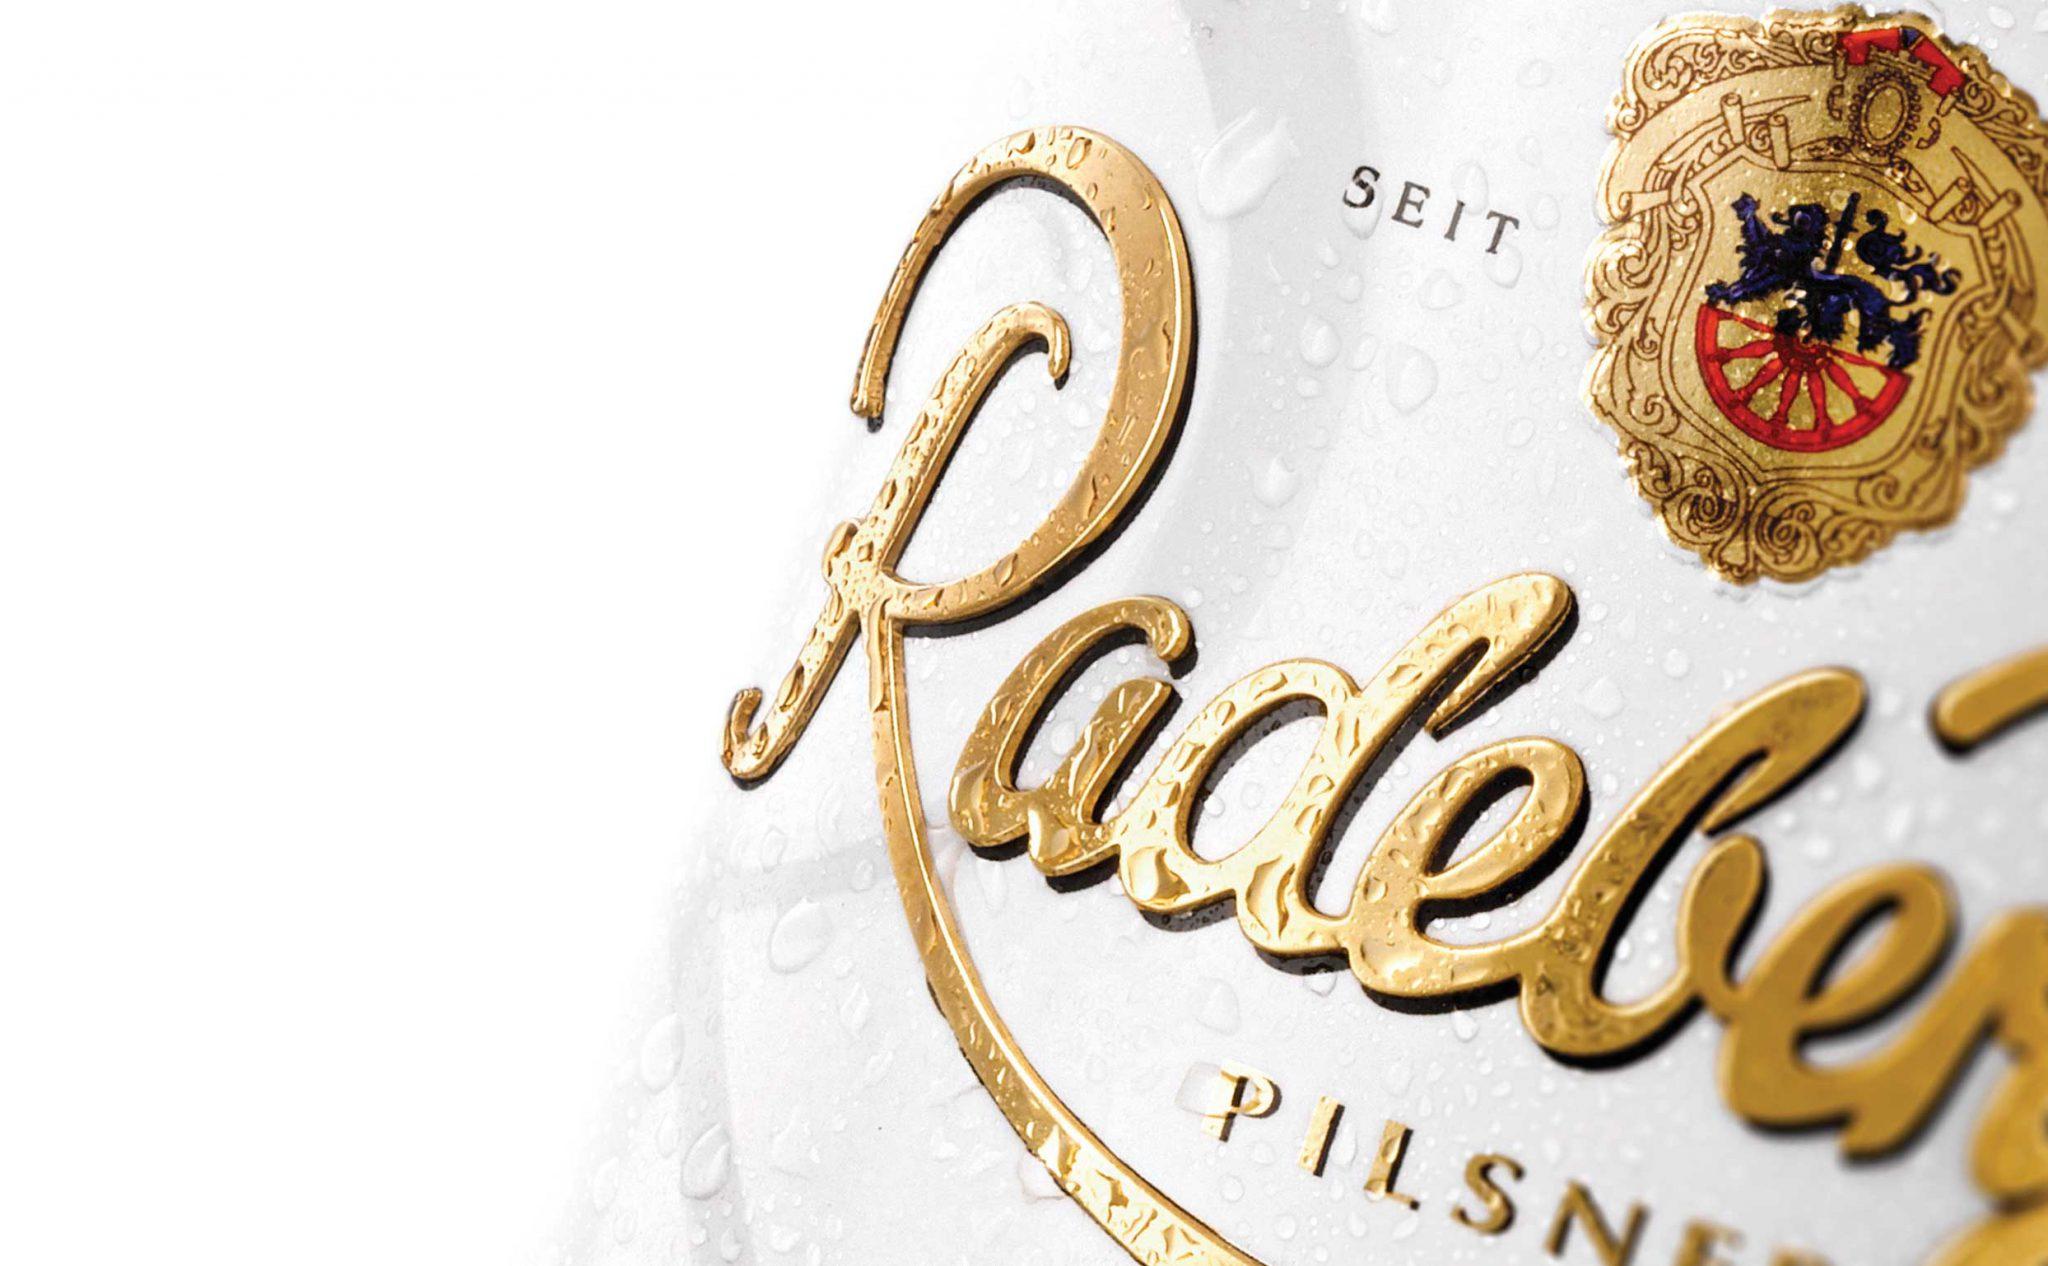 Radeberger Pilsner Label Closeup